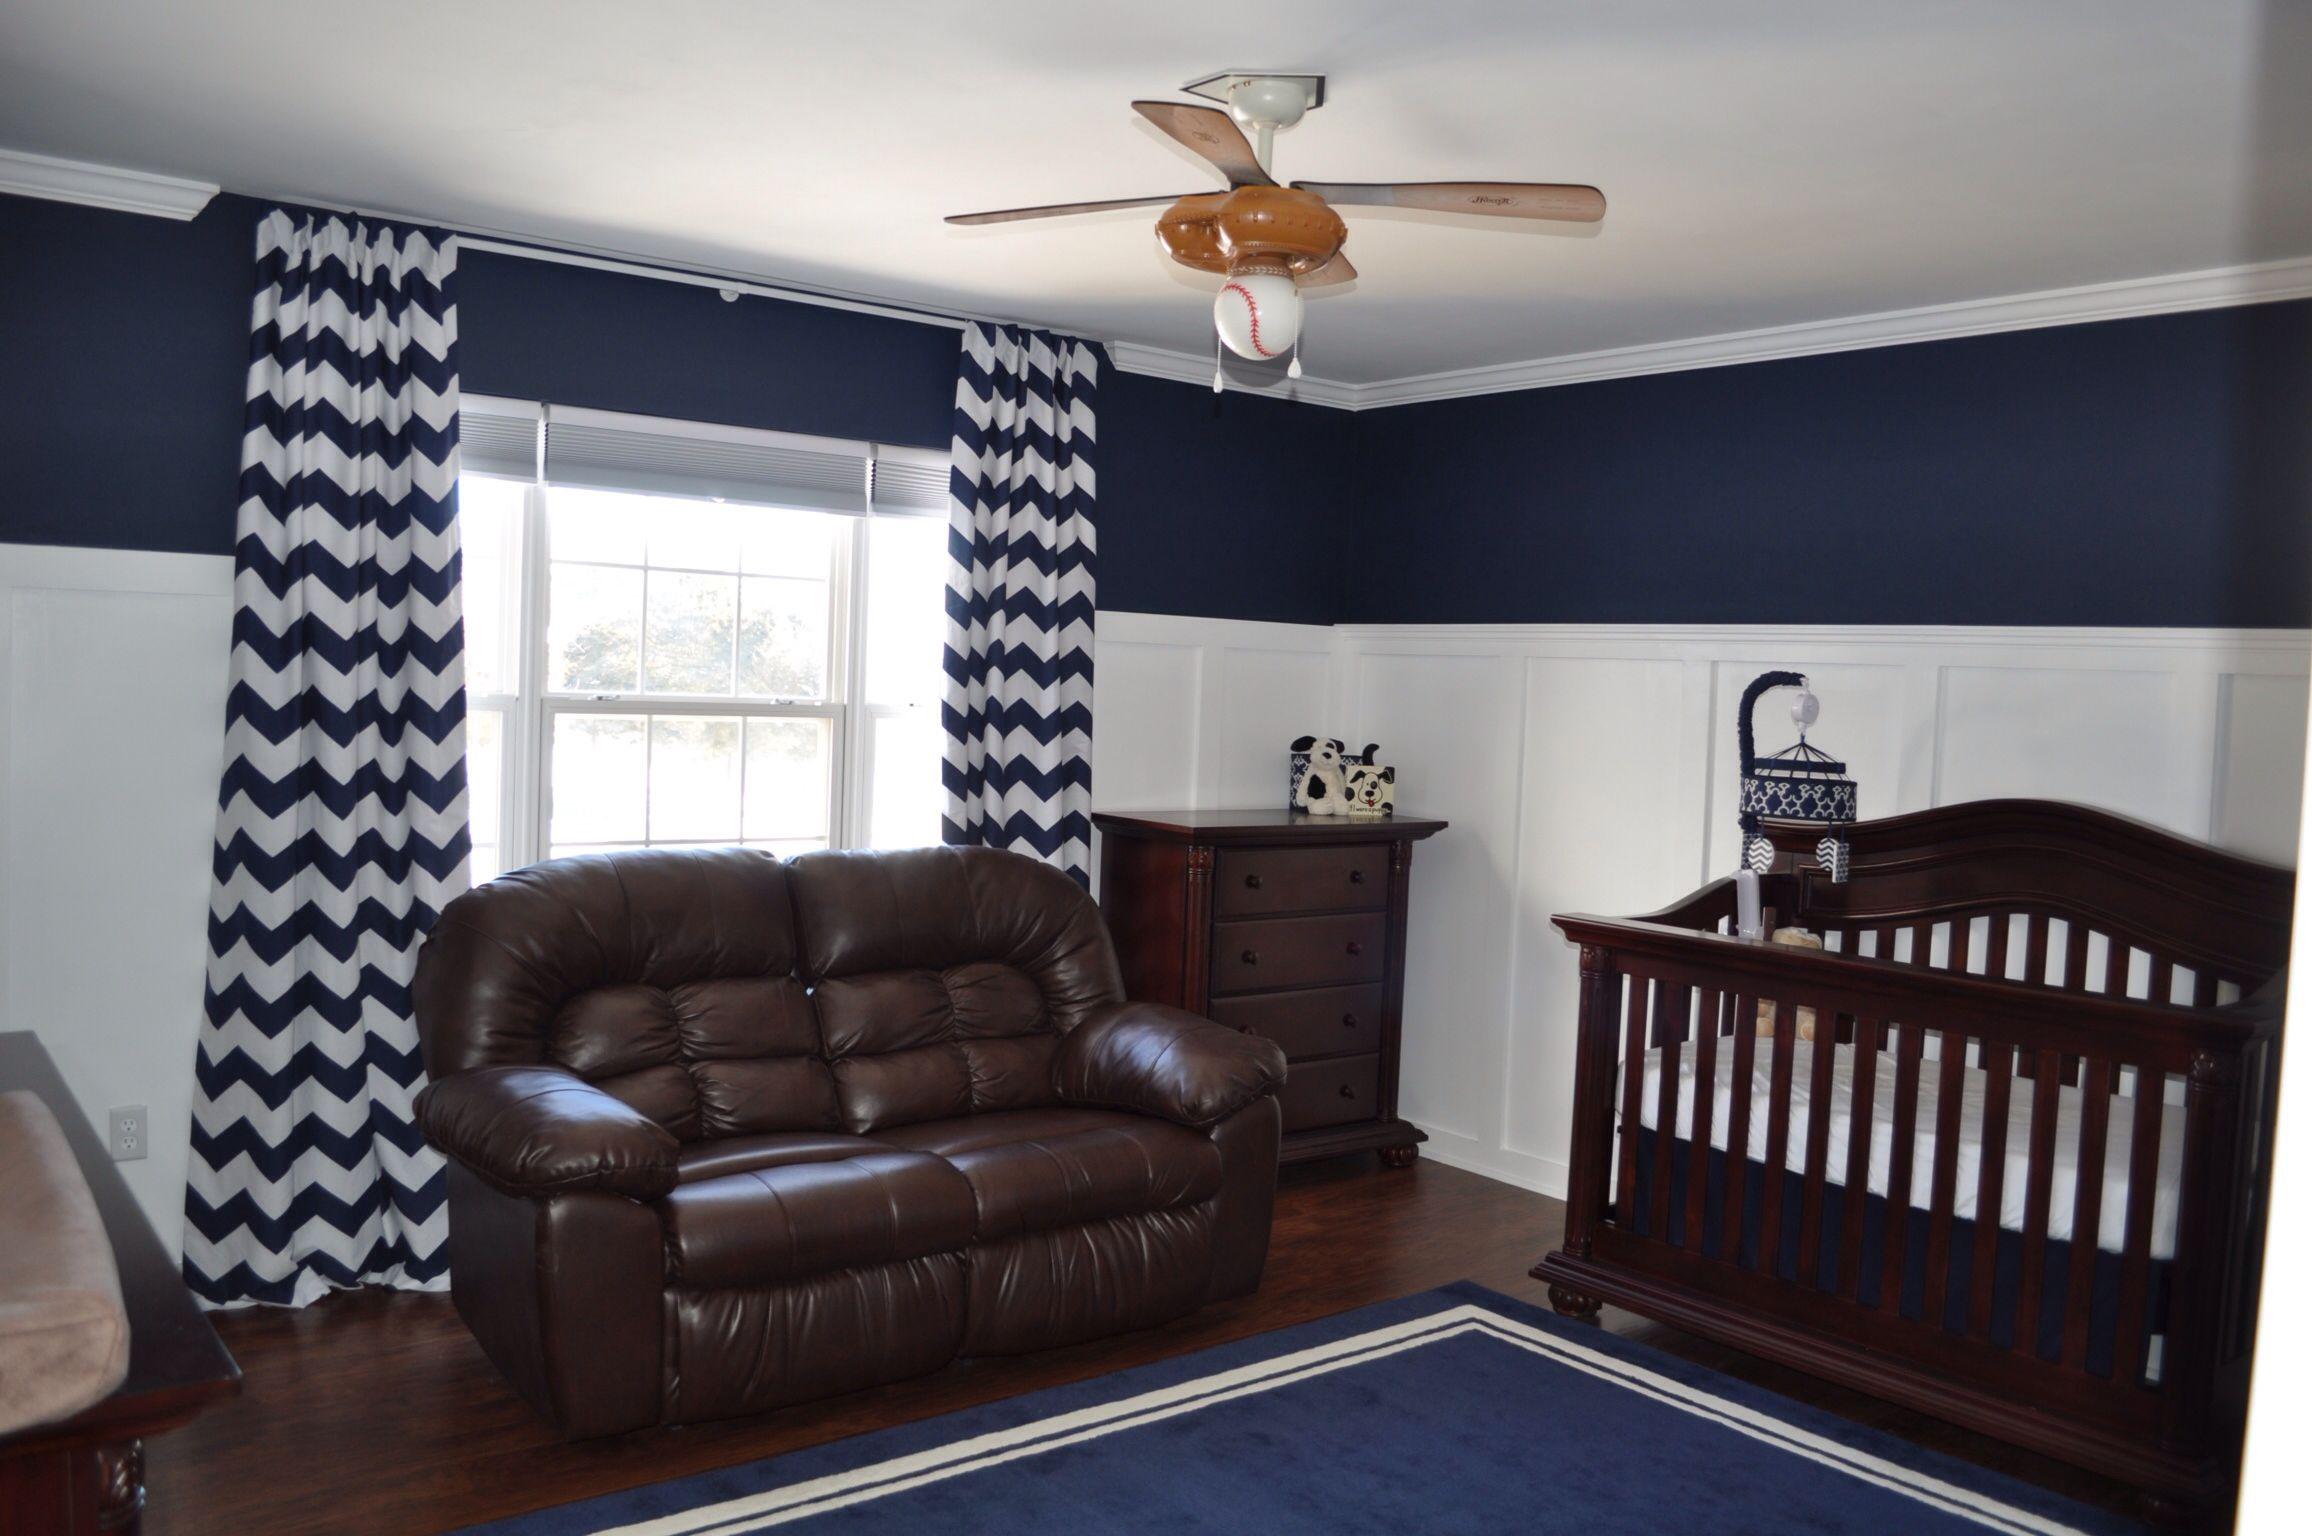 Gregory S Room Batten Board Walls Pottery Barn Naval Paint Pbk Rug Pbk Chevron Curtains